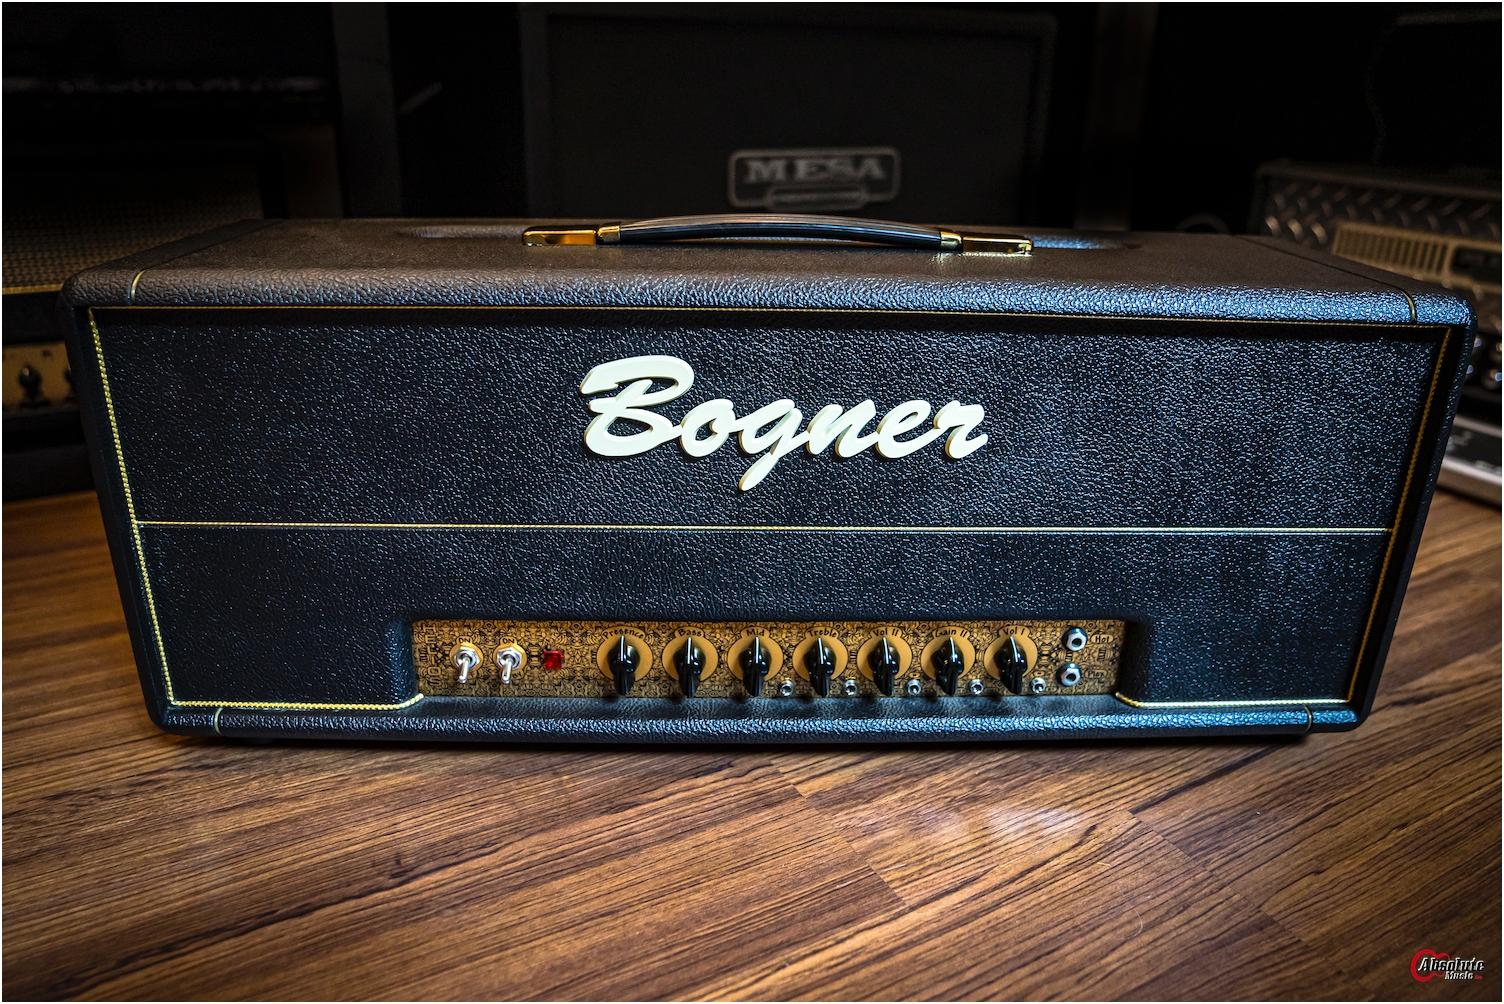 Bogner Head Amp Helios 100 Watt